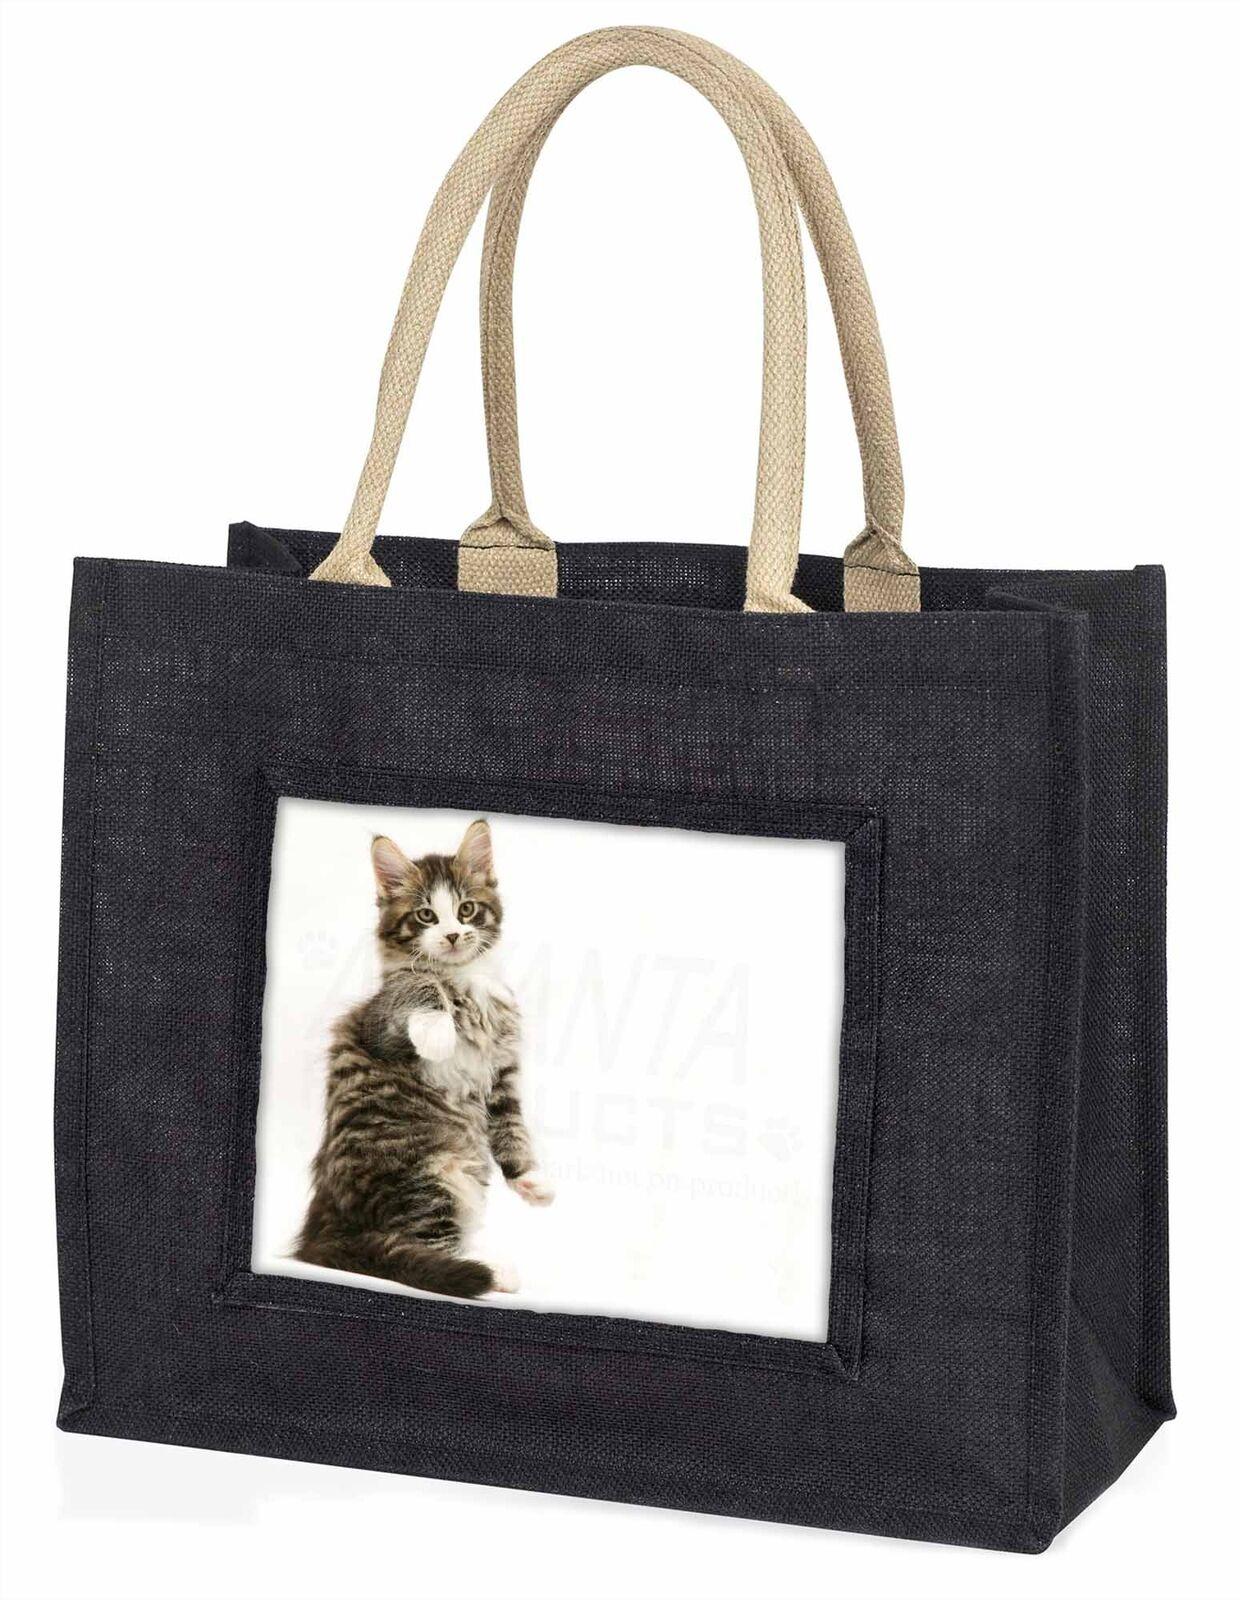 AC-201BLB Brown Tabby Cats Face Large Black Shopping Bag Christmas Present Idea